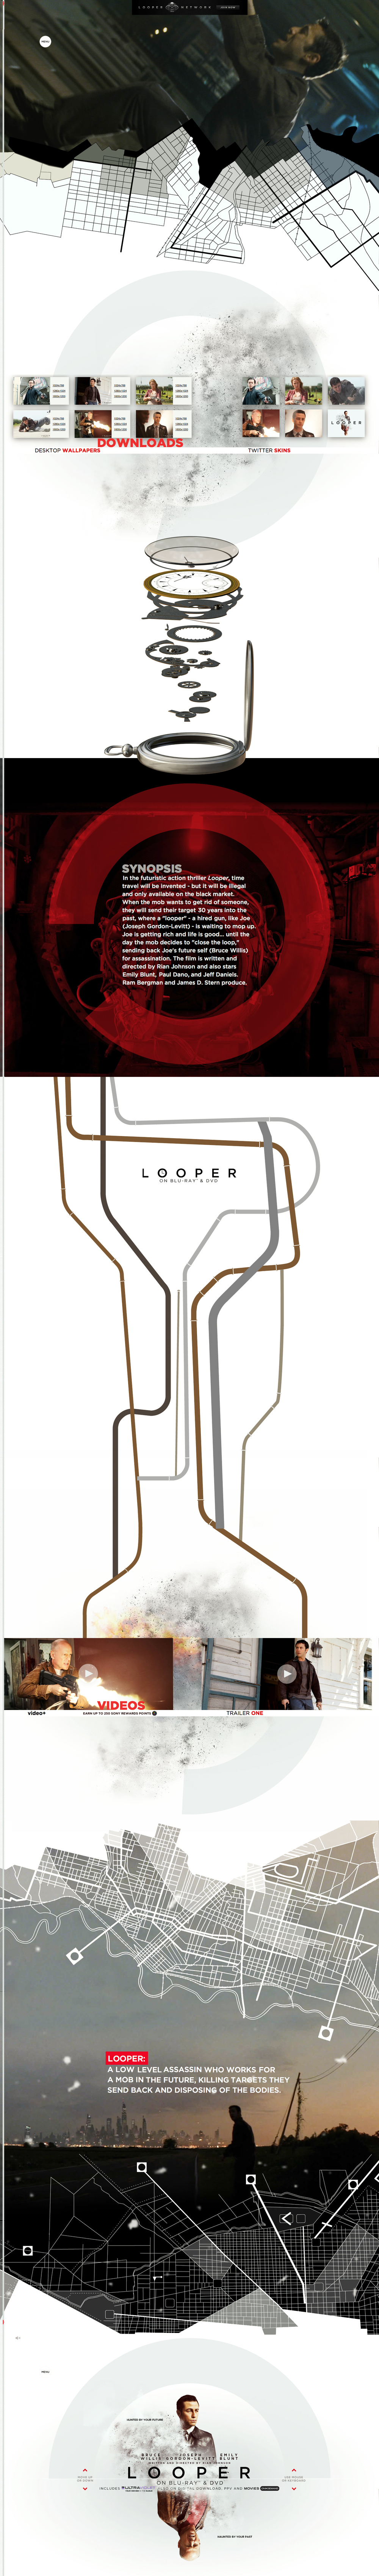 Looper-EPK-Up.jpg